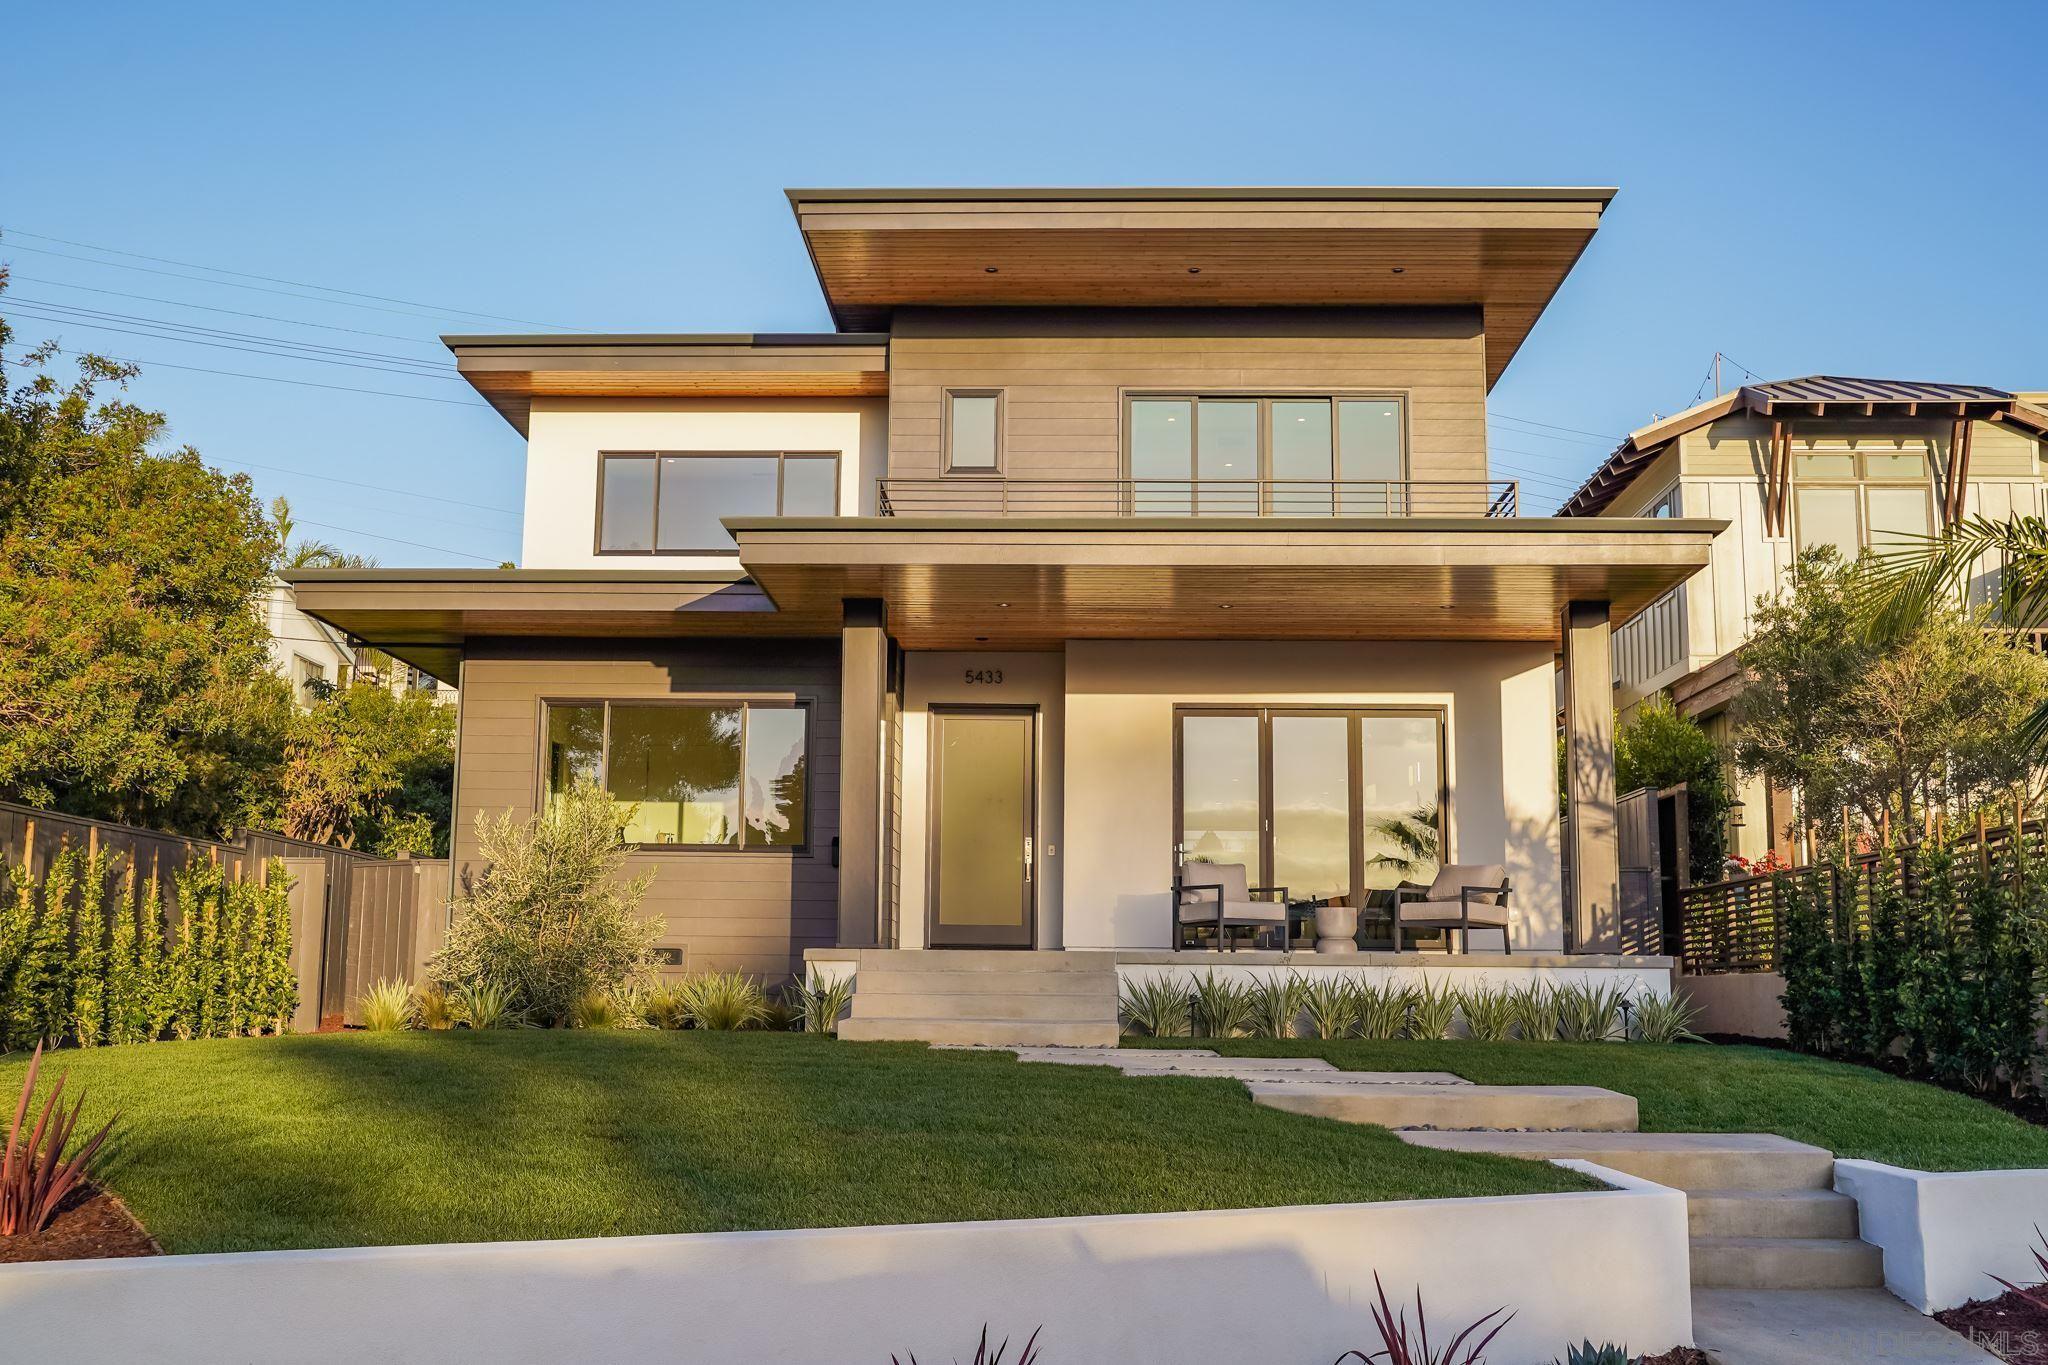 Main Photo: LA JOLLA House for sale : 4 bedrooms : 5433 Taft Ave